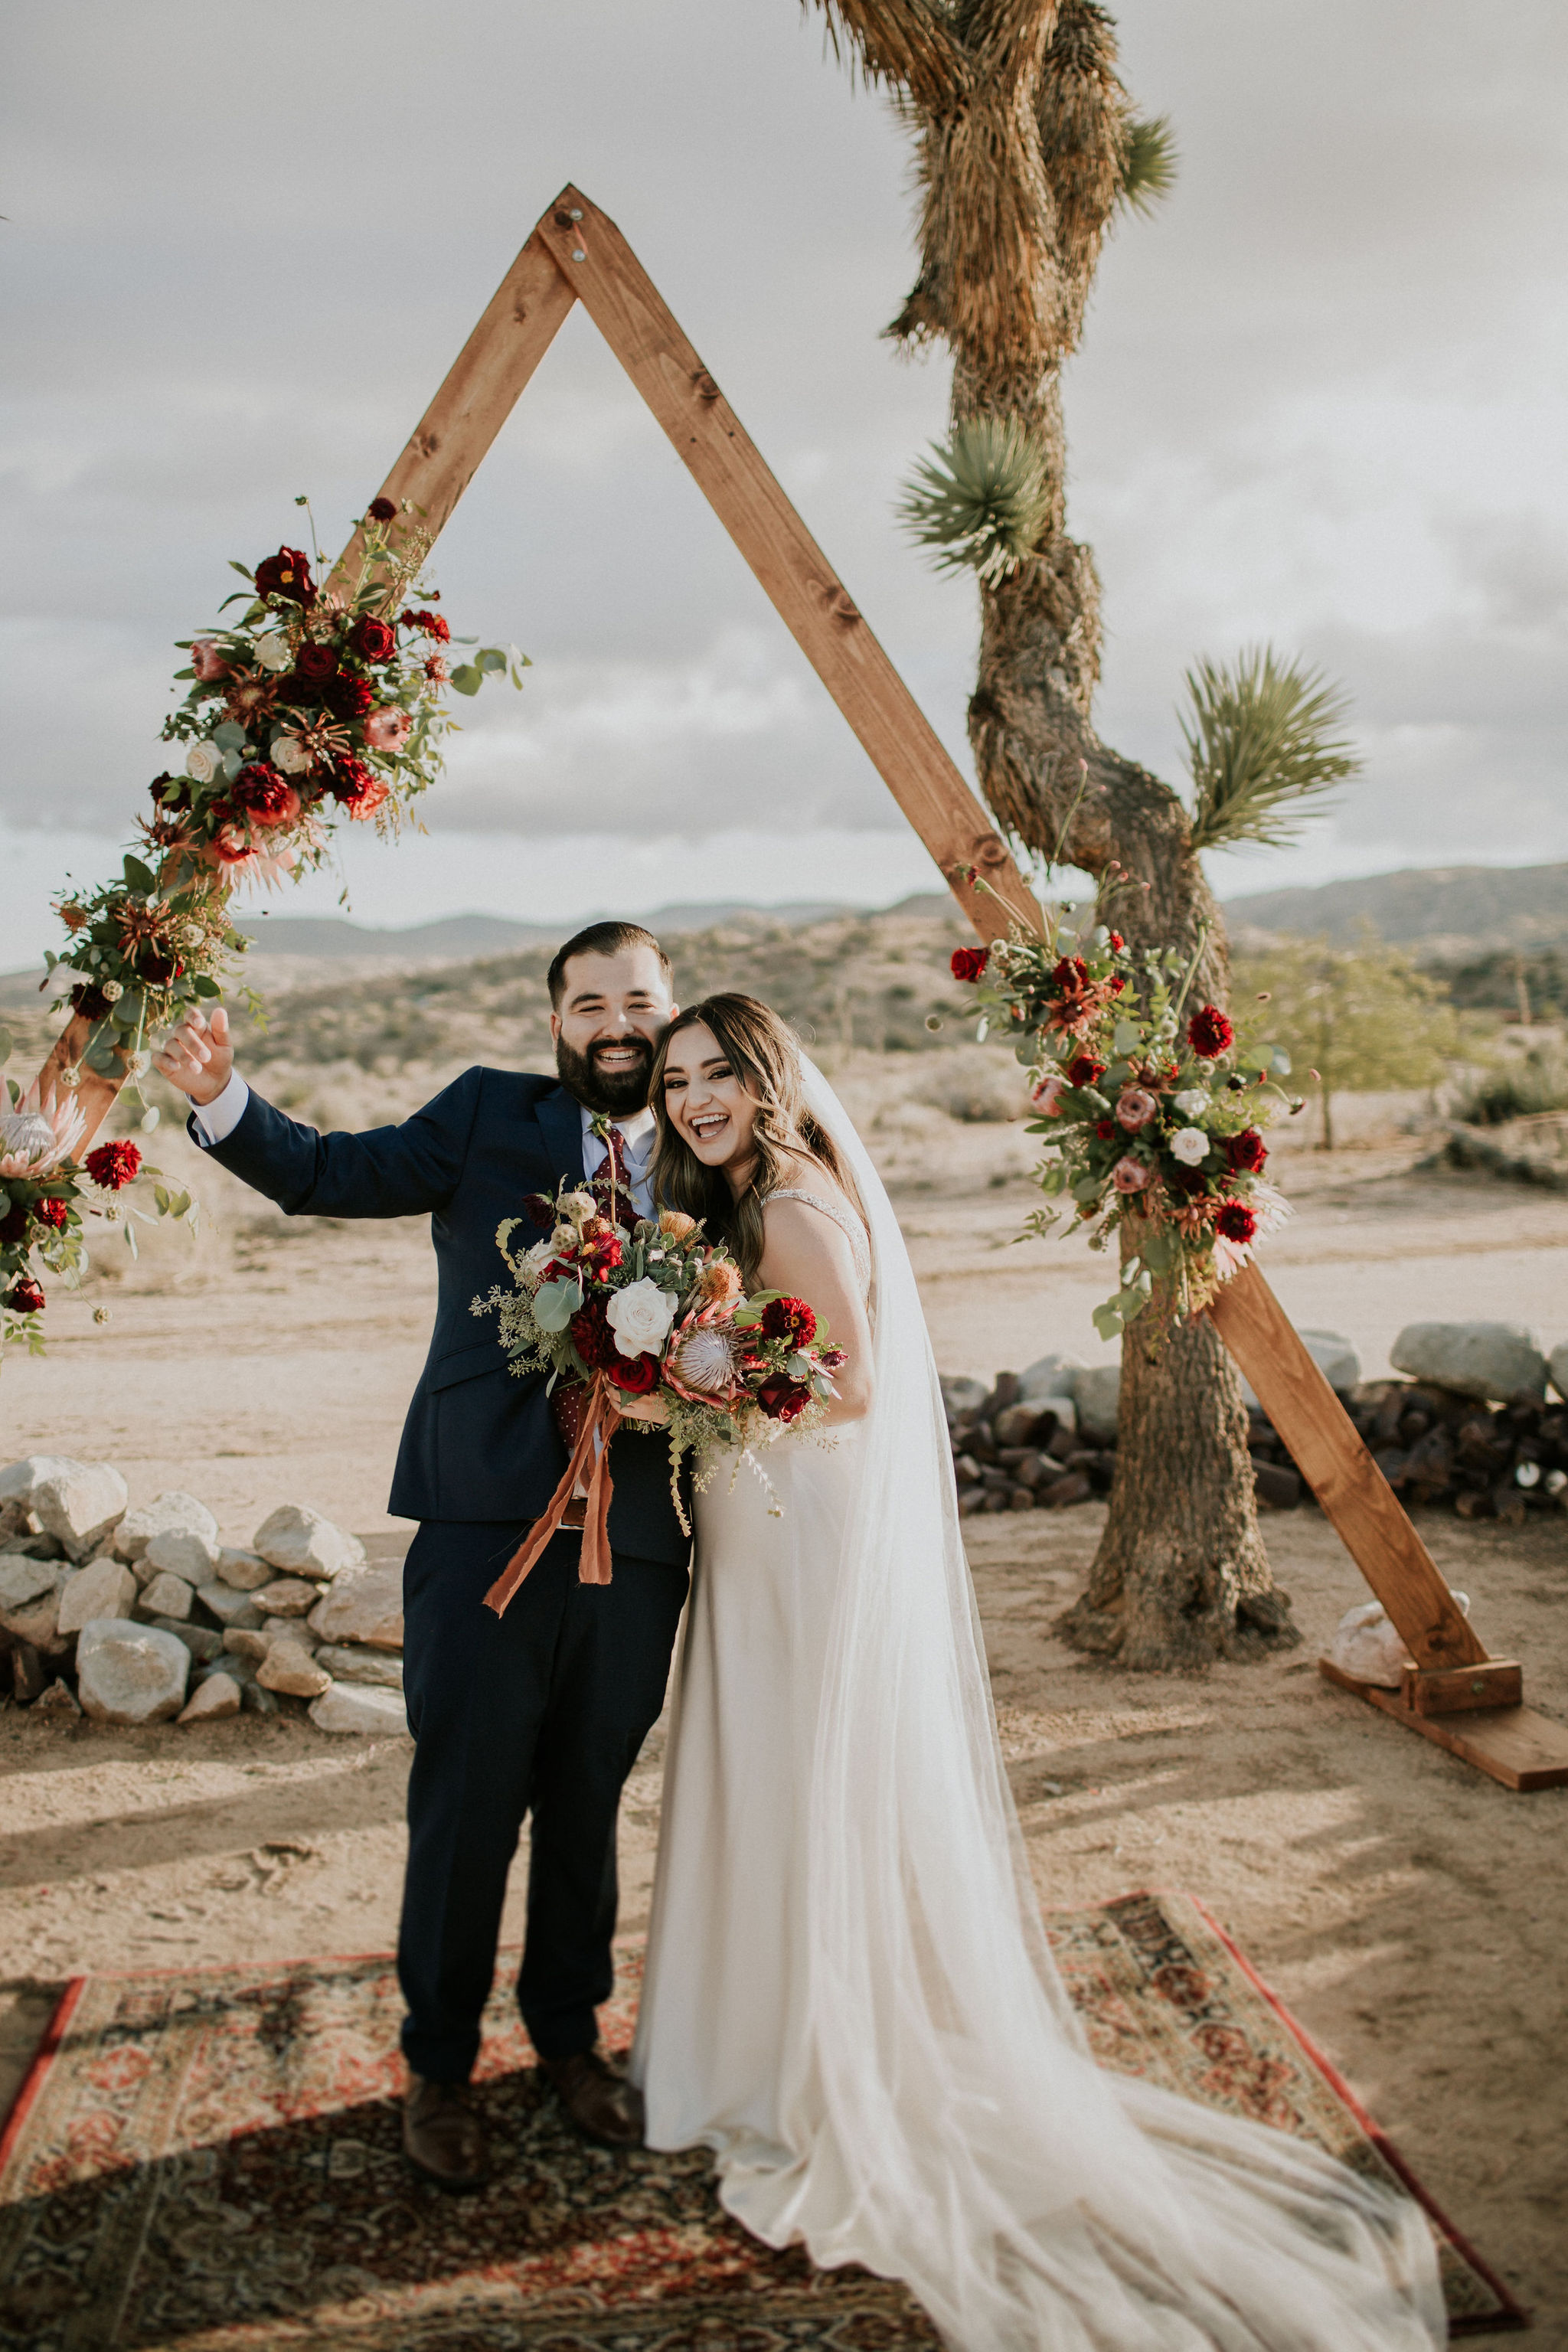 RimrockRanch-JoshuaTree-Wedding-Jami-Laree-595.jpg